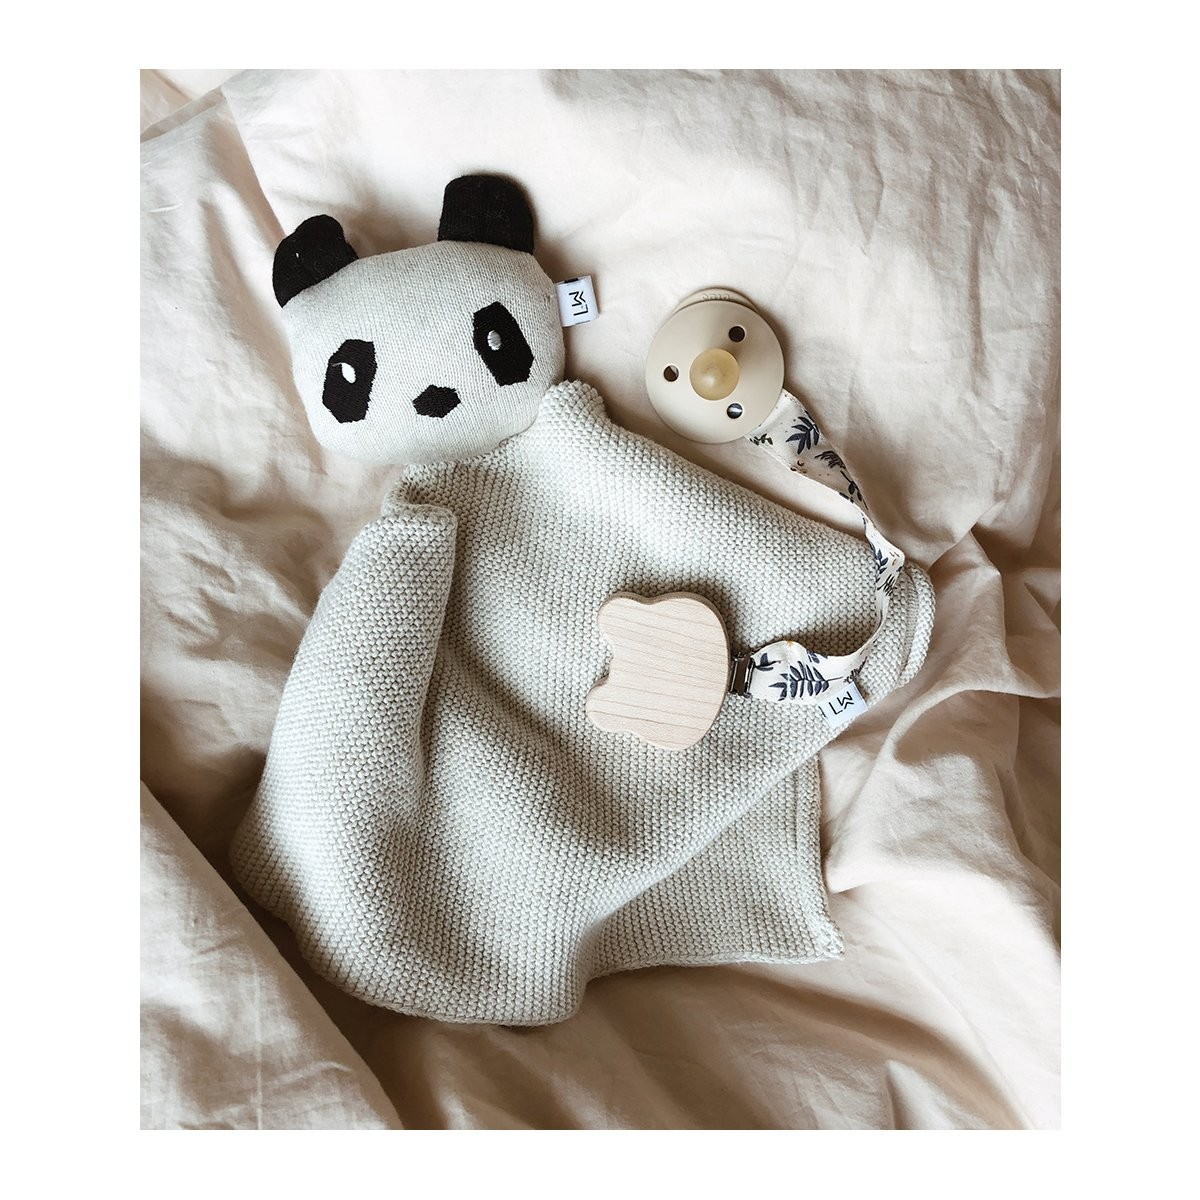 Ping Cuddle Cloth